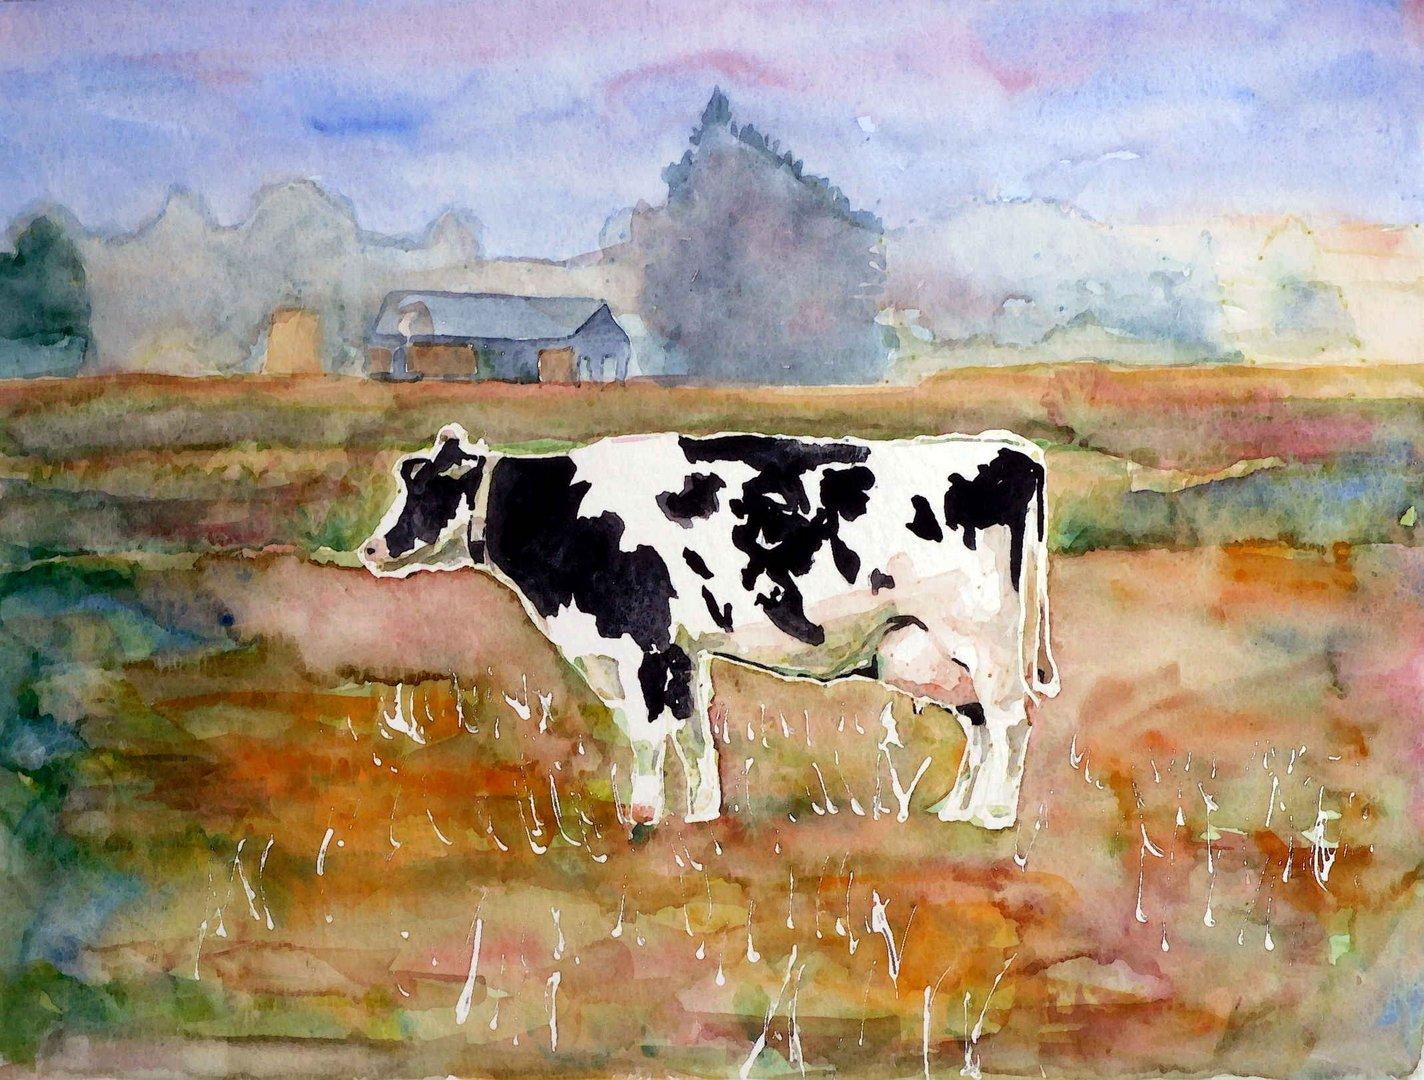 Kuh in einem Aquarell